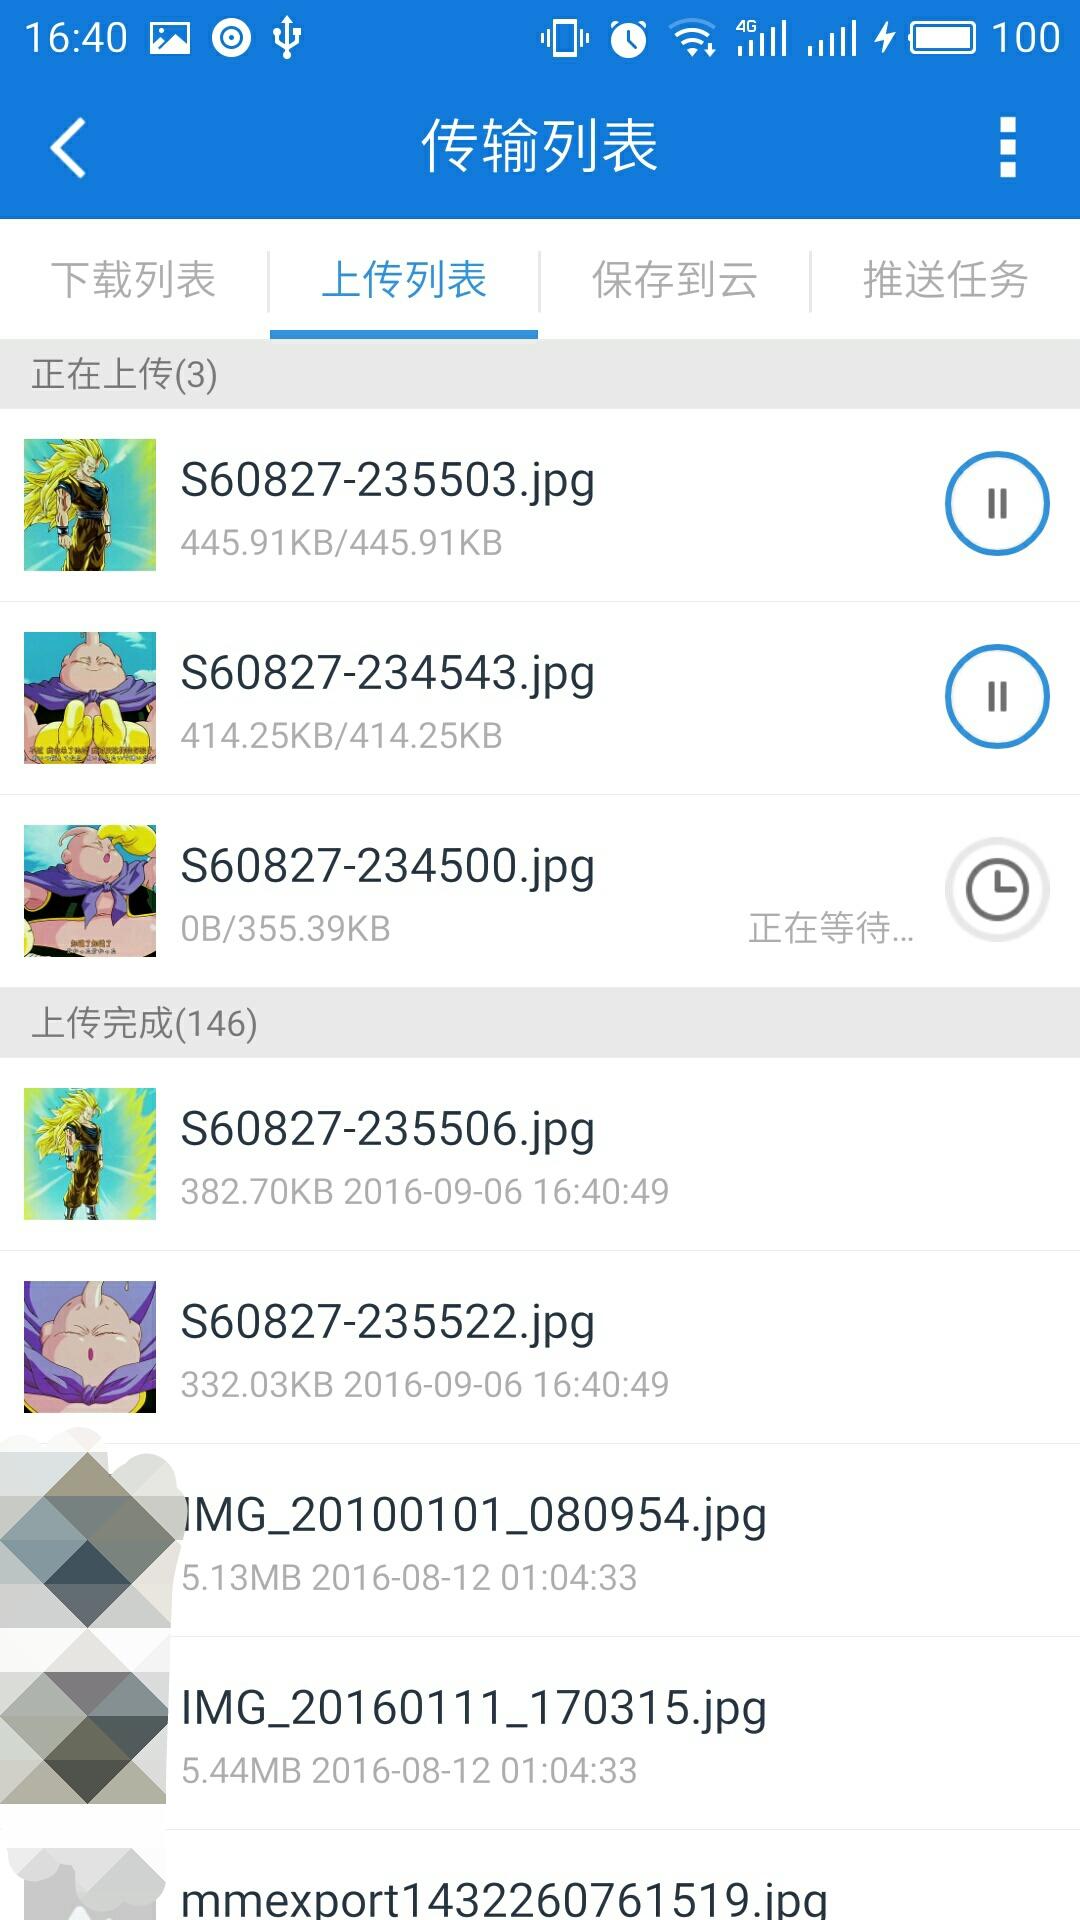 S60906-16405731(1).jpg